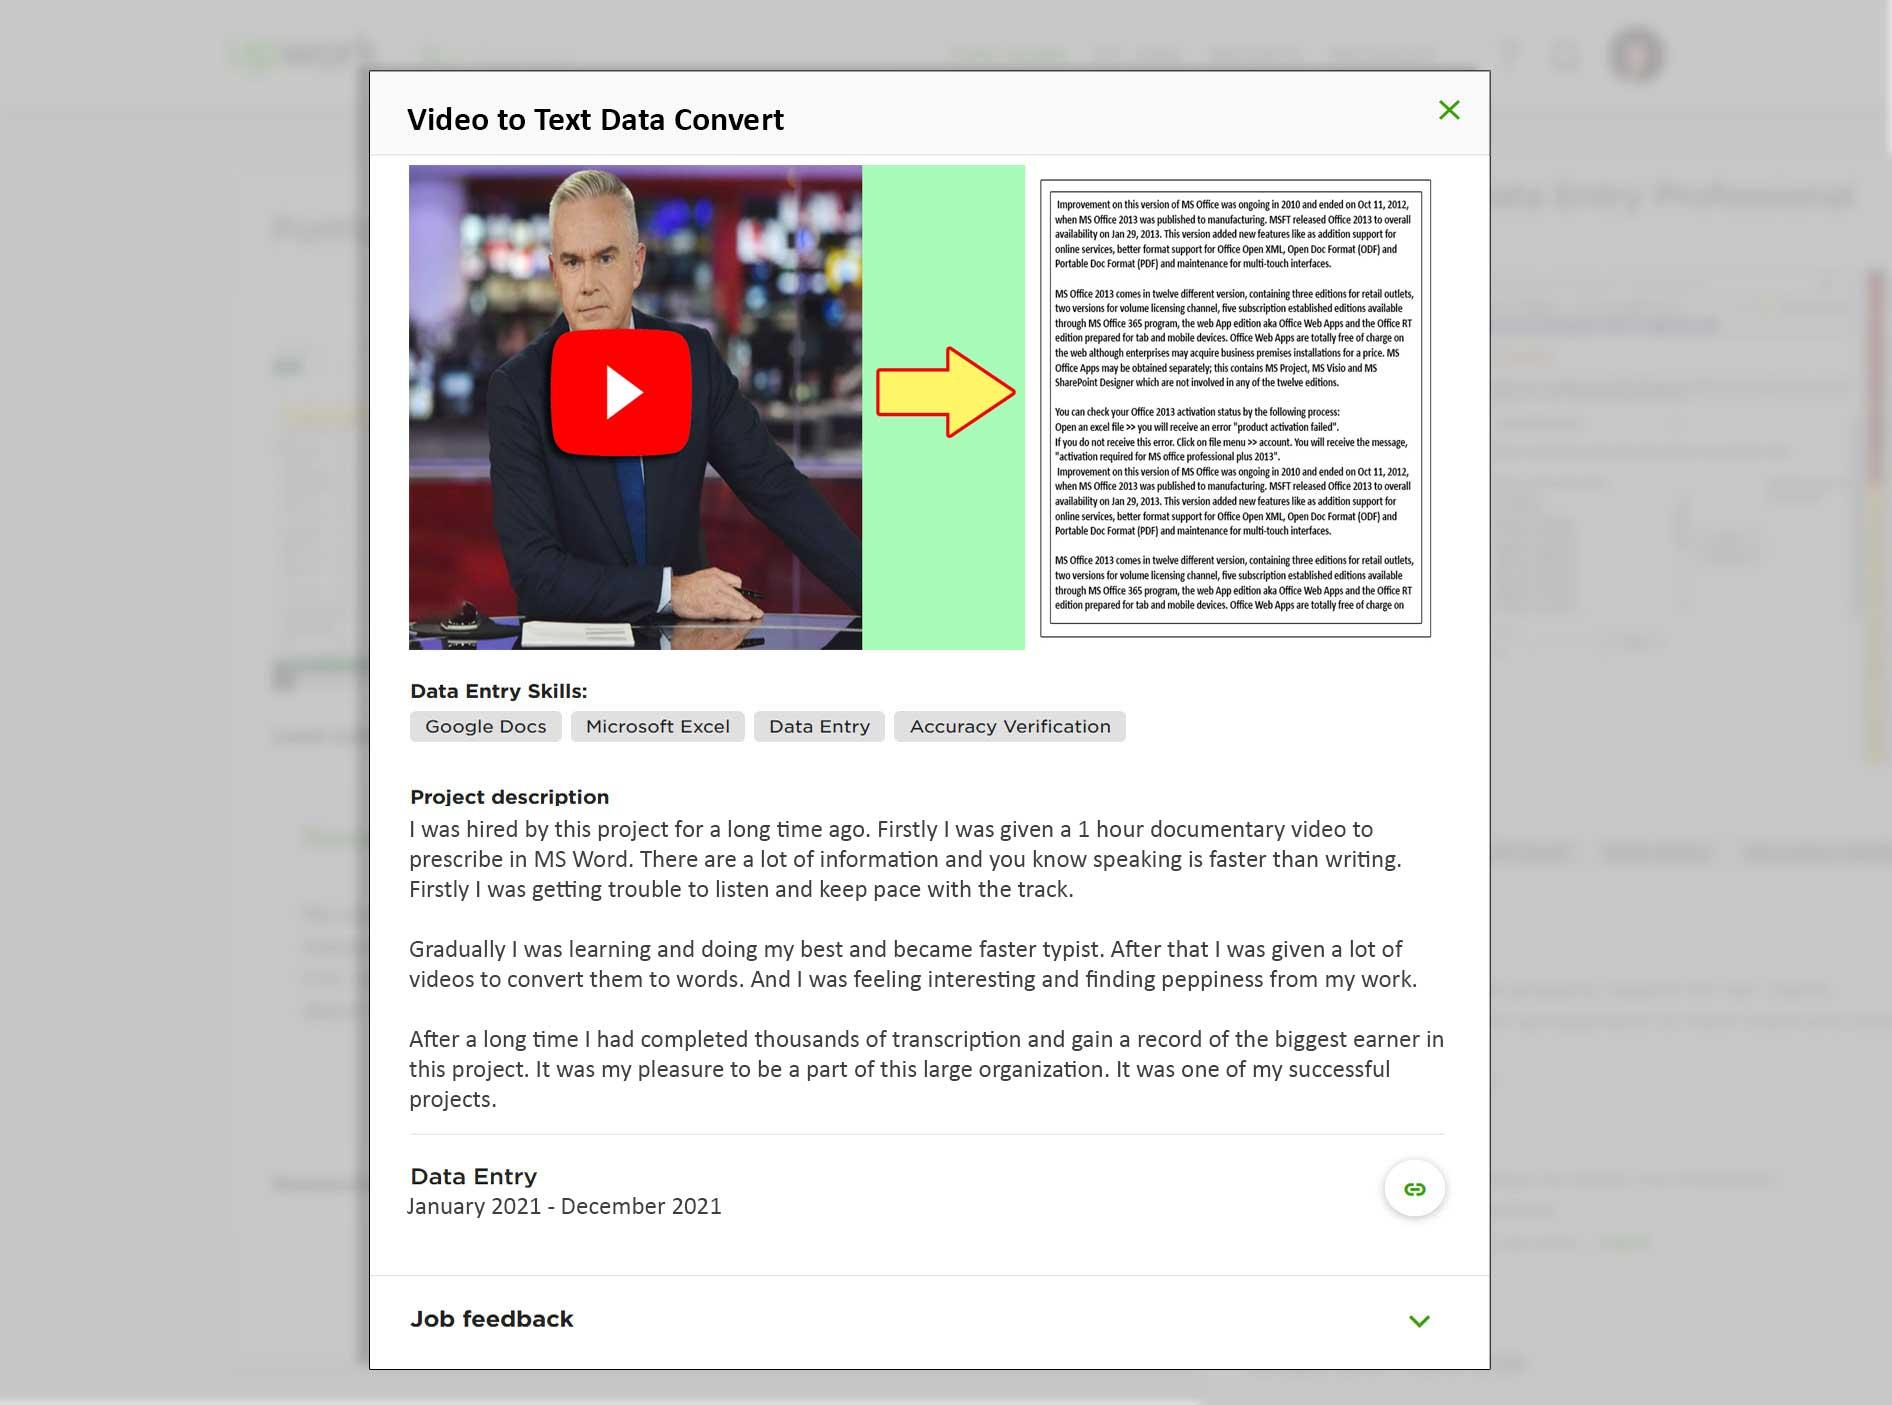 data entry portfolio sample (video to text data convert)